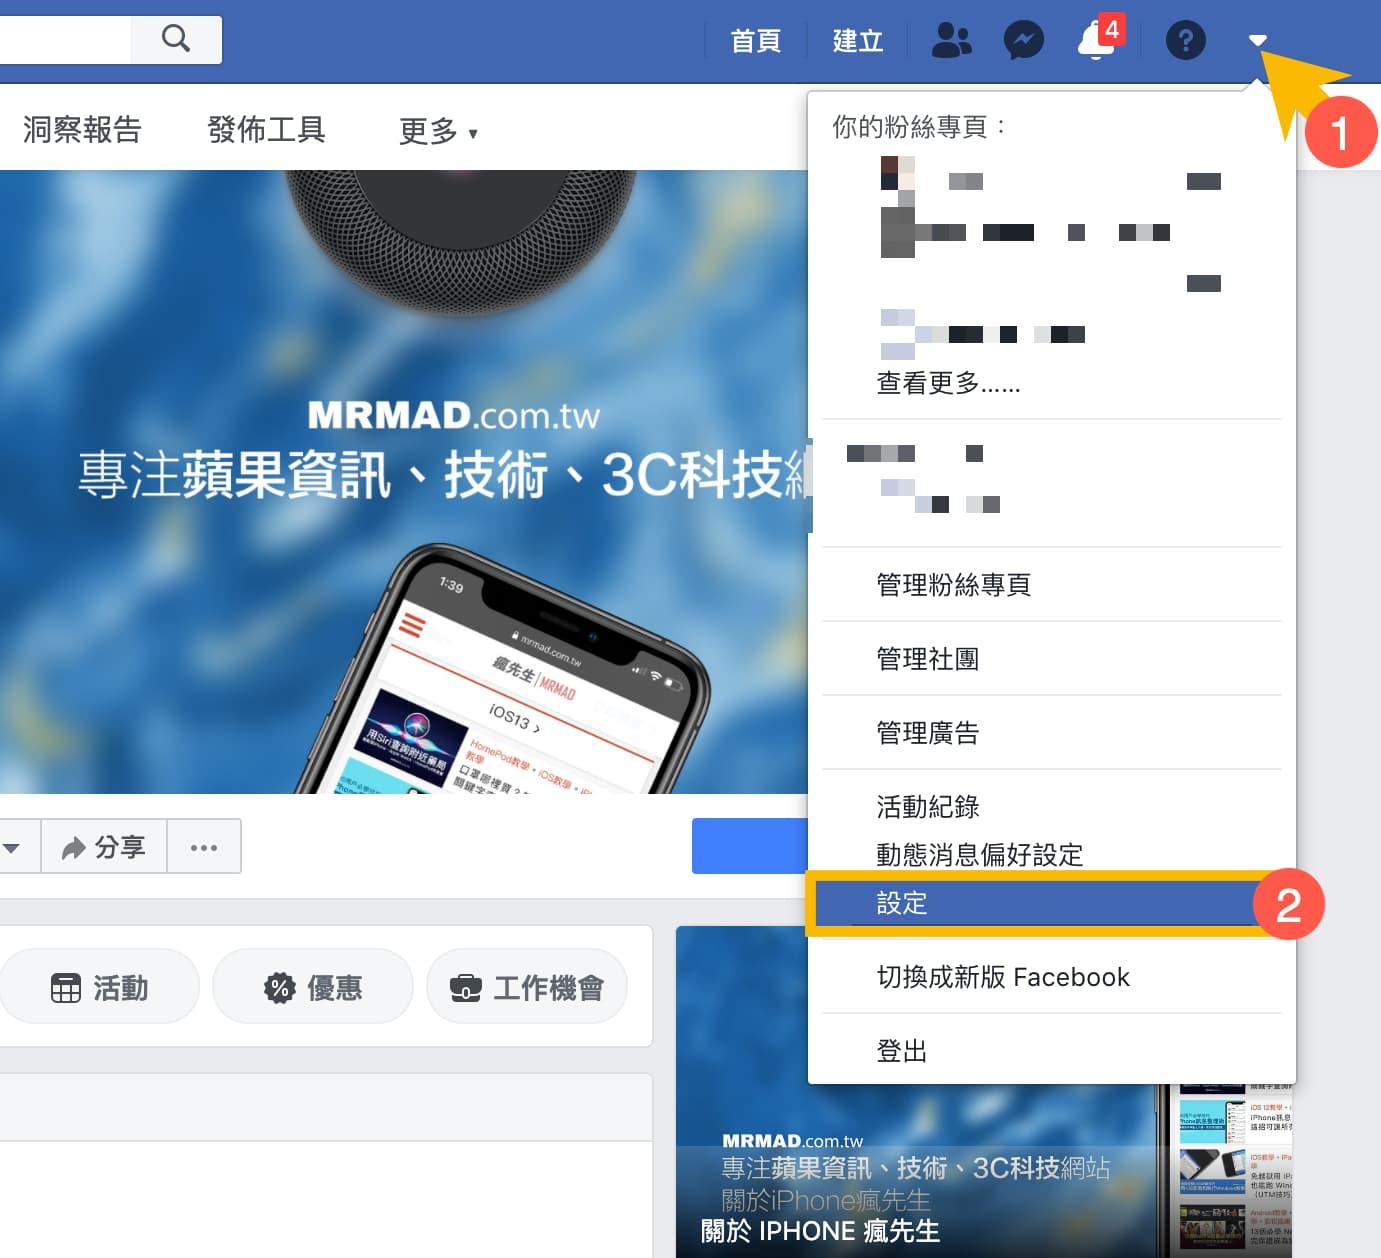 FB相簿下載搬家技巧,教你一鍵打包下載,轉移Google相簿 - 瘋先生